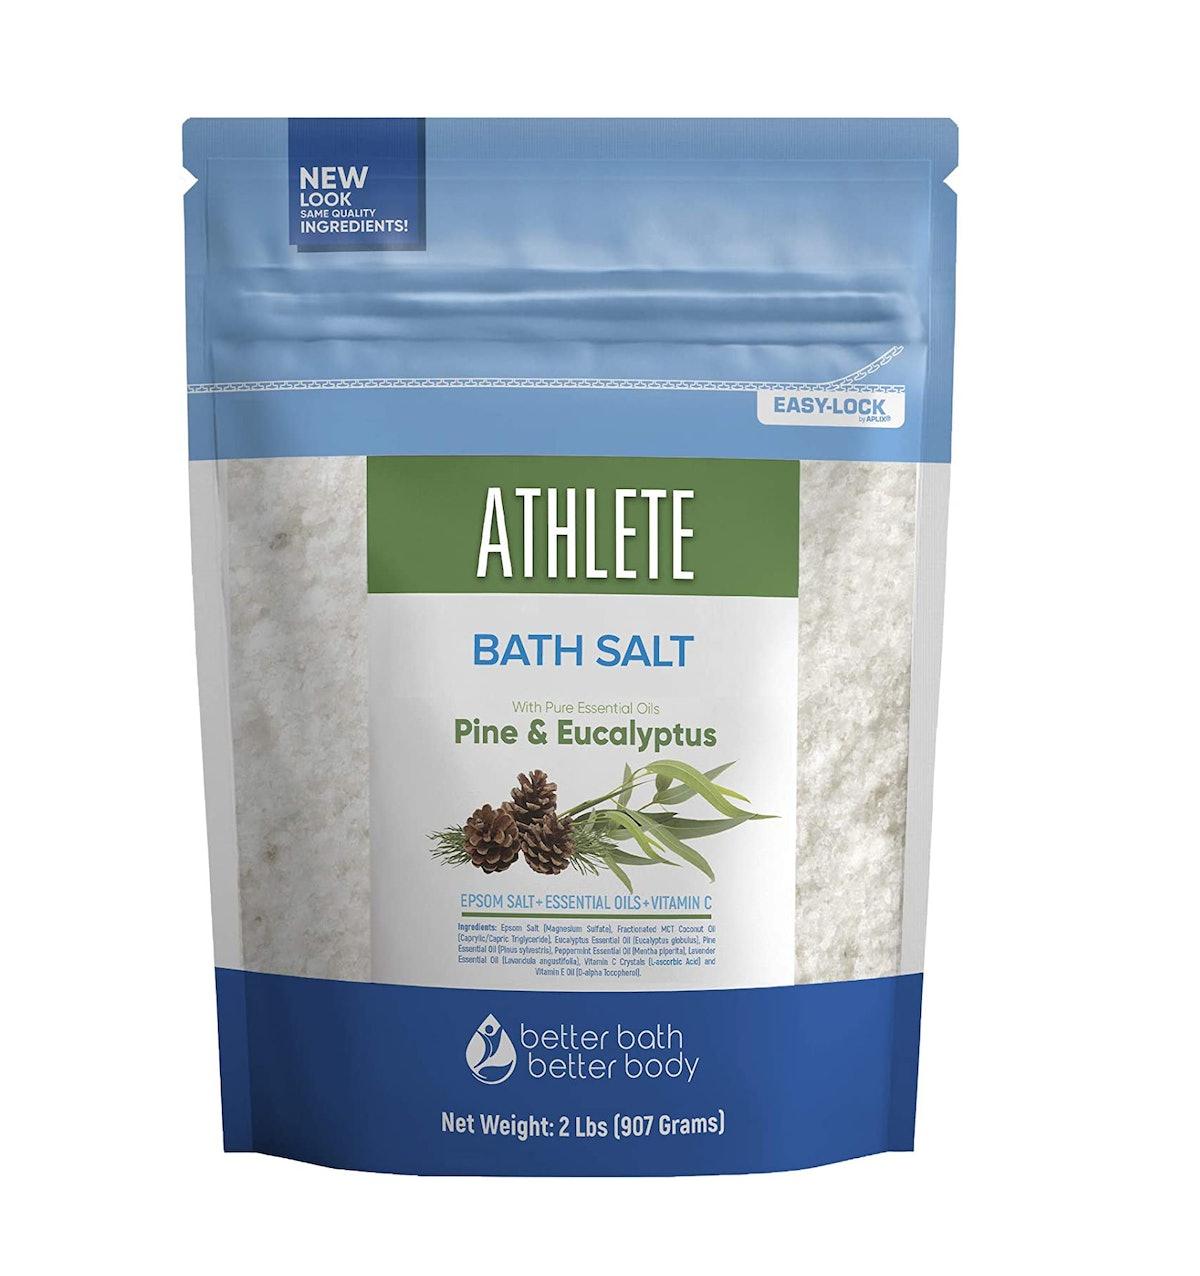 Better Bath Better Body Athlete Bath Salt